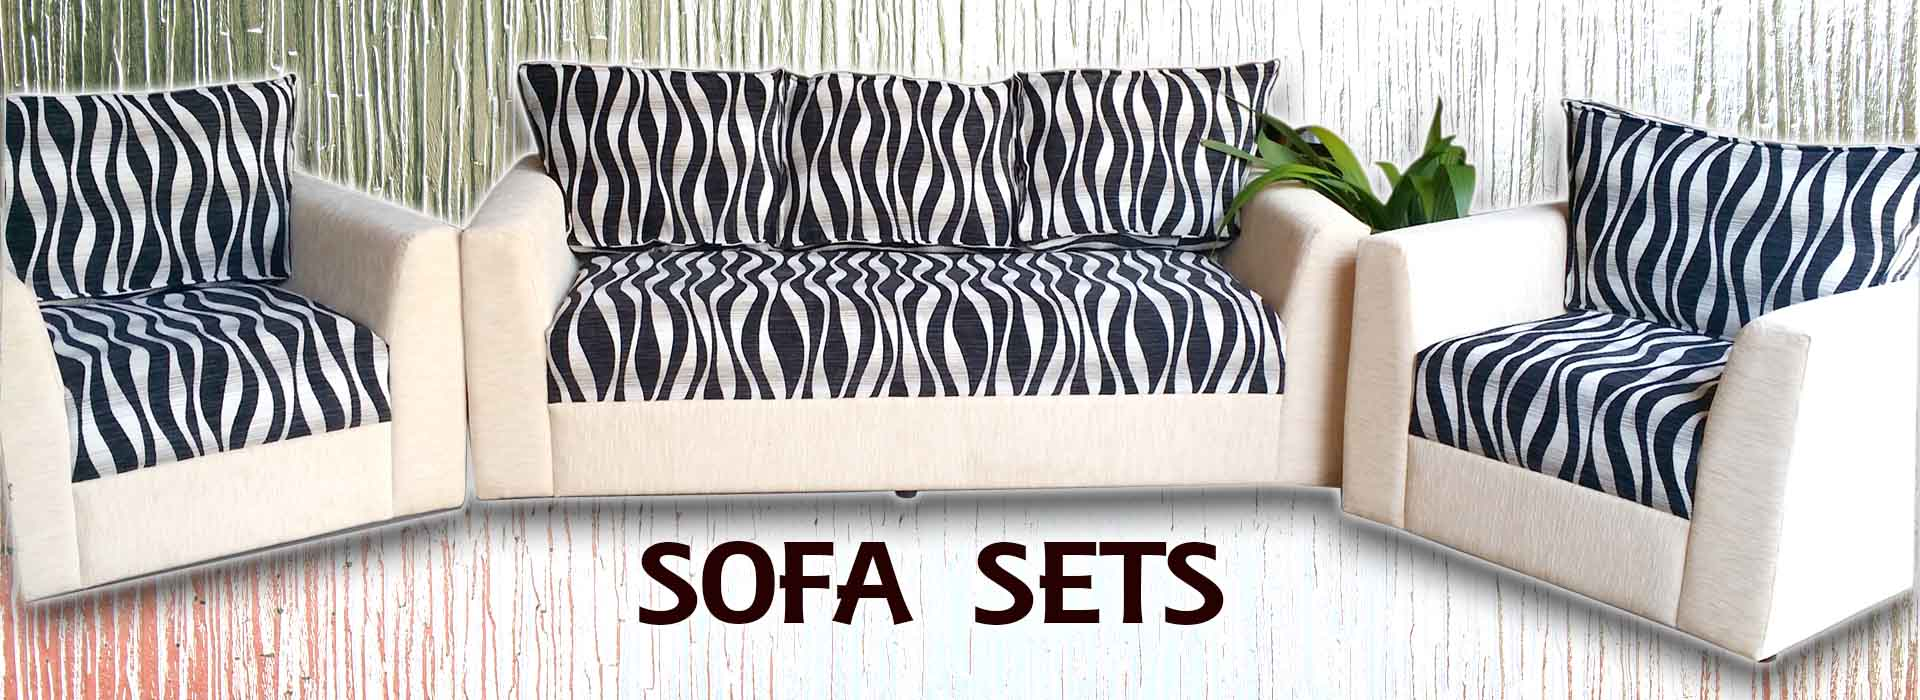 Sofa Sets Sofa Sets Sri Lanka Prices Of Sofa Sets In Sri Lanka